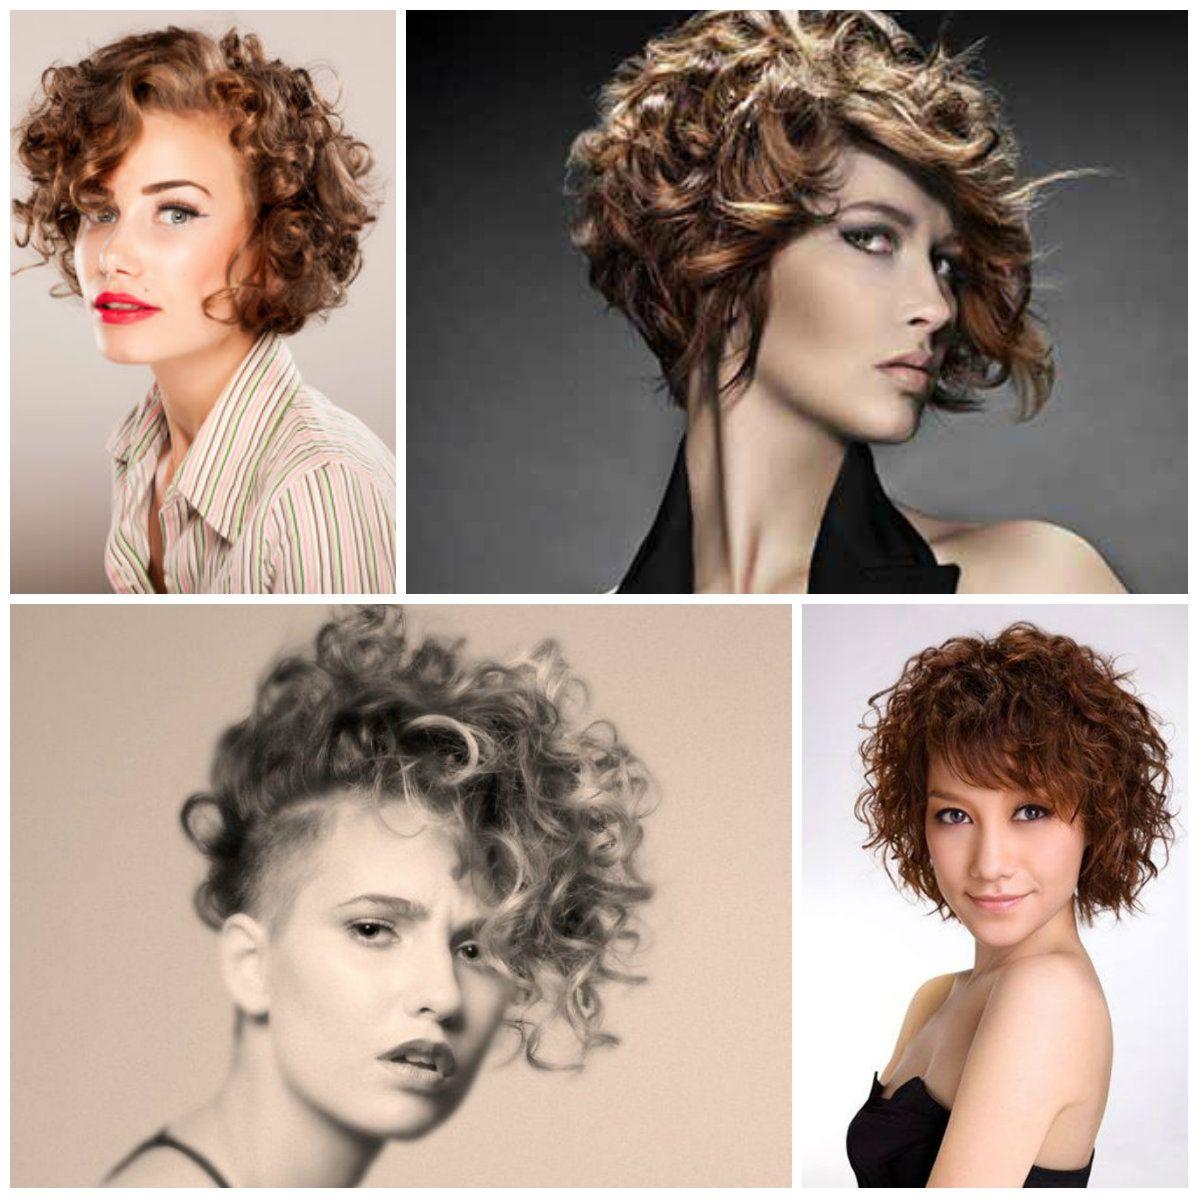 Phenomenal Short Wavy Bob Hairstyles 2017 Kcbler Com Hair Today Hot Hairstyles For Men Maxibearus